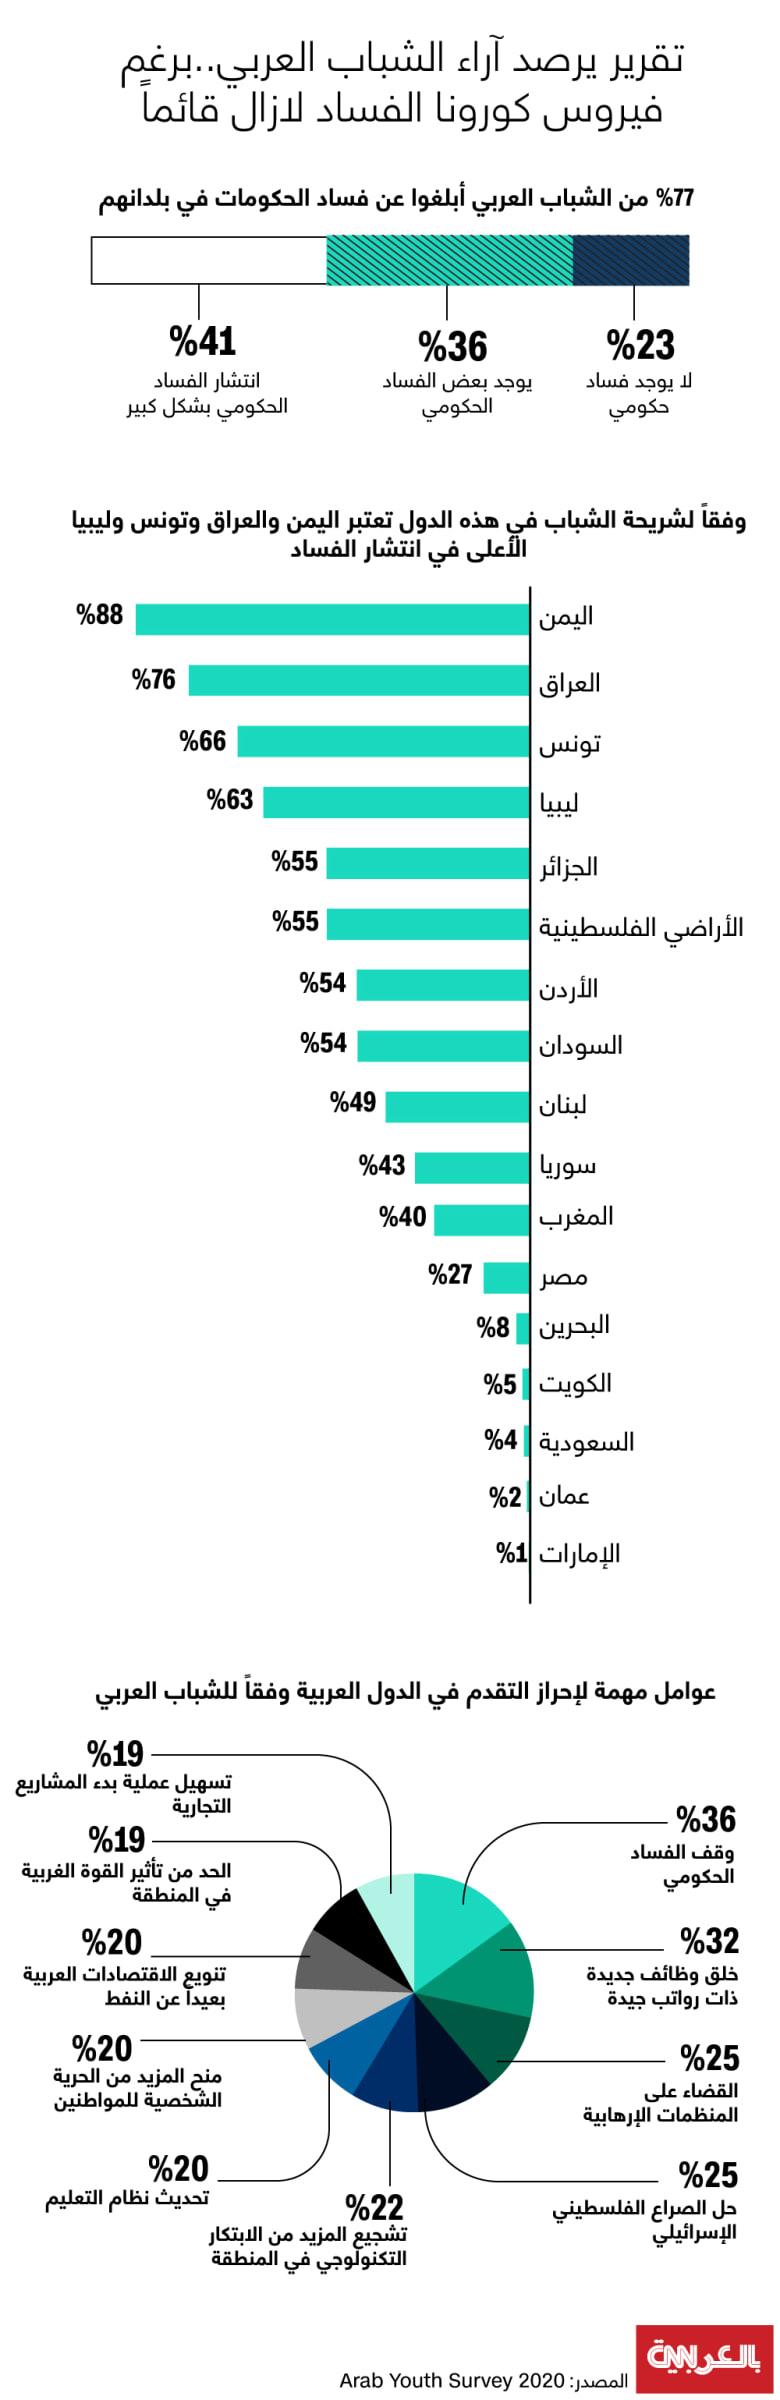 arab-youth-survey-corruption